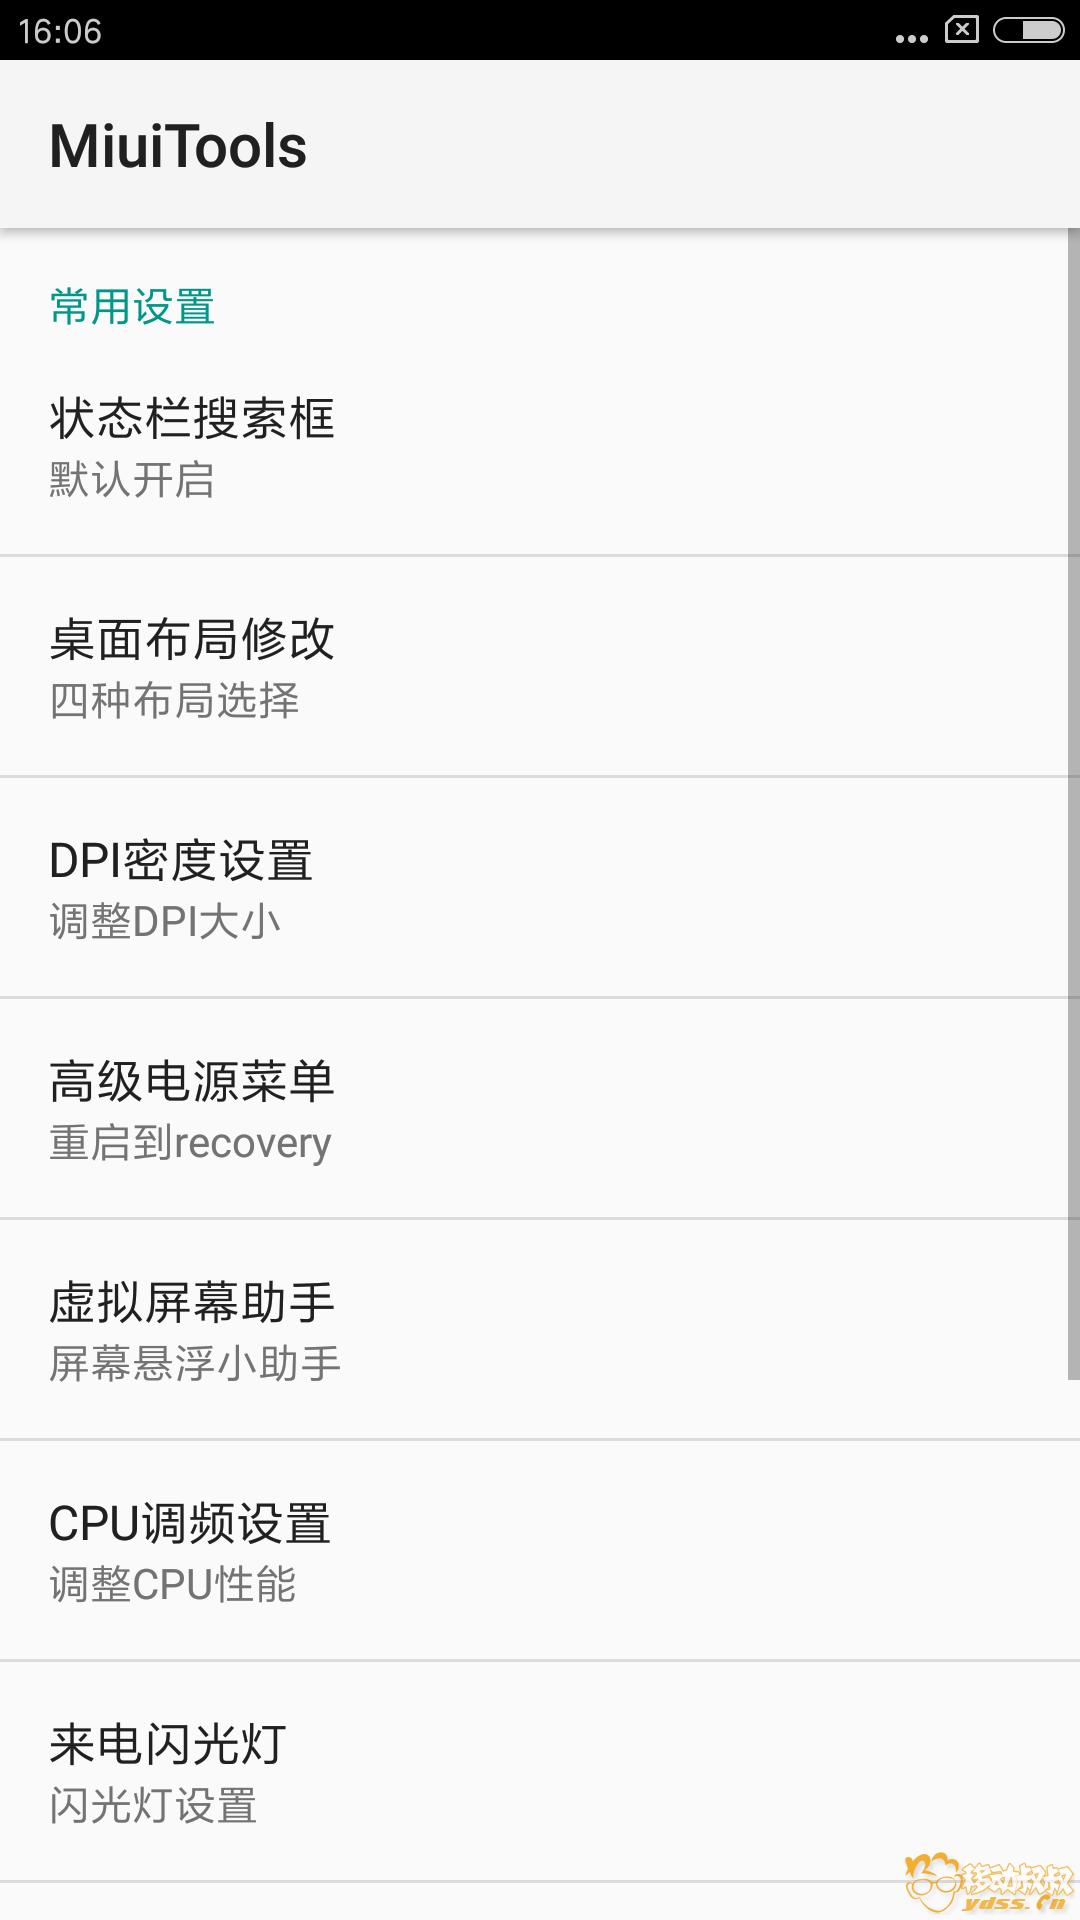 Screenshot_2017-08-12-16-06-14-527_com.anzhi.hwsettings.png